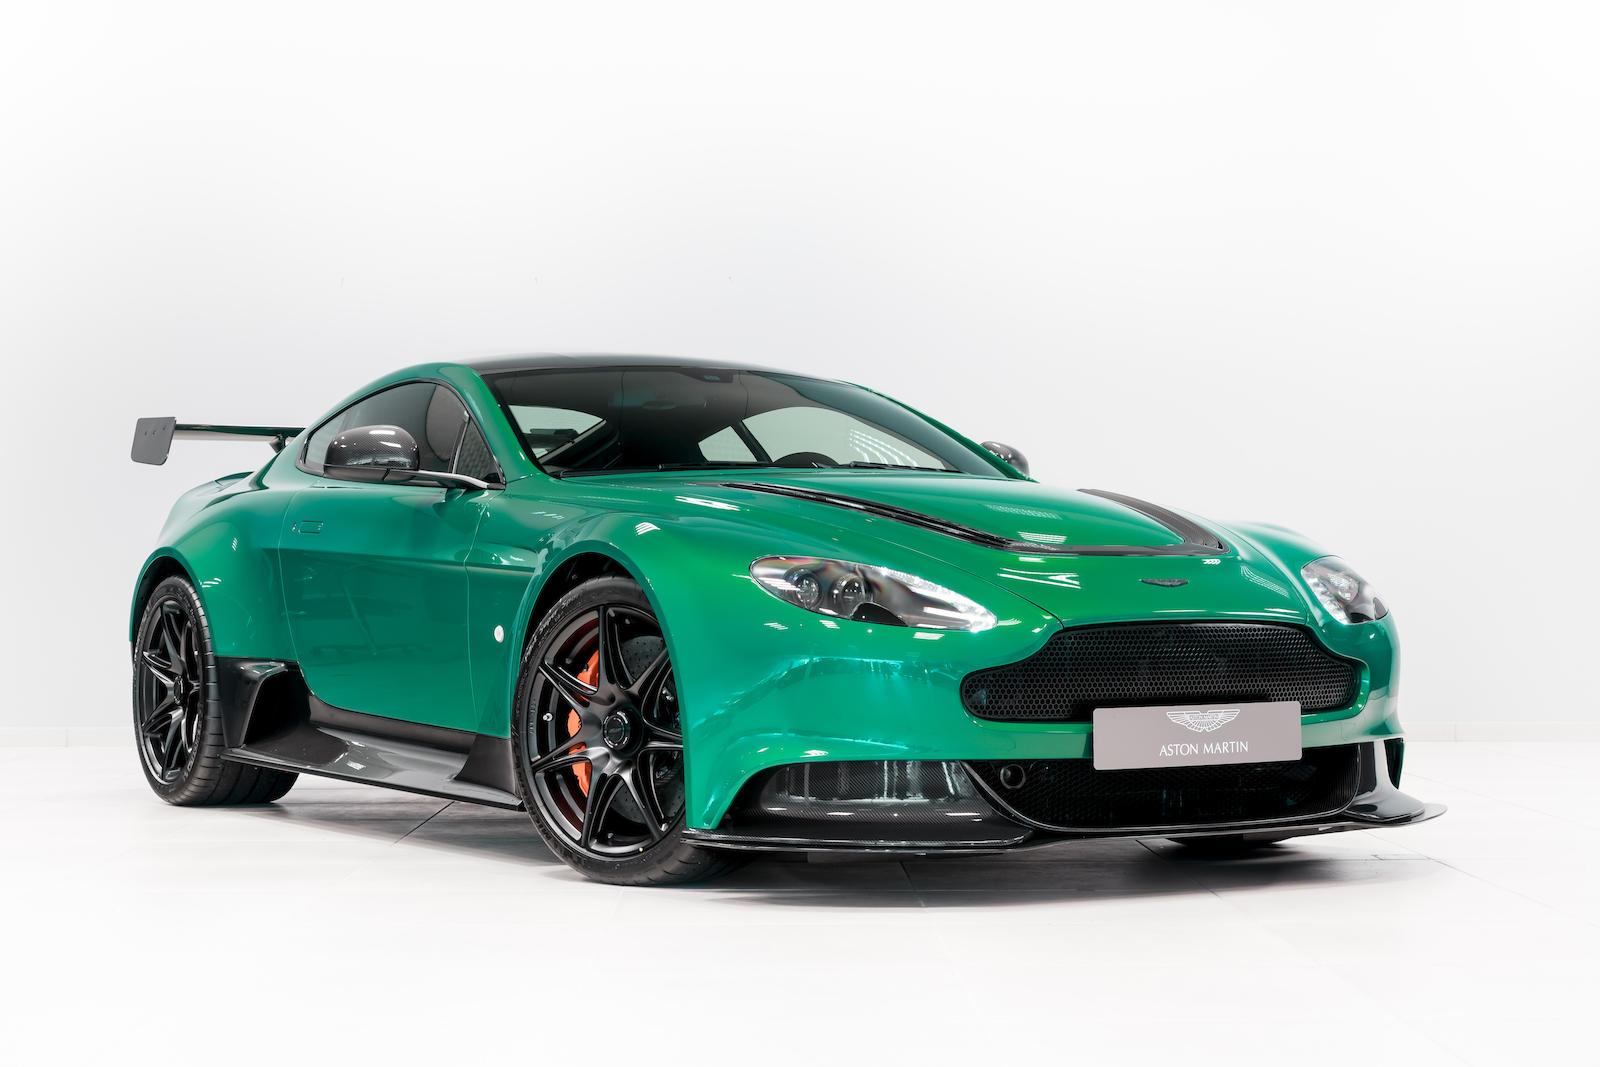 OneOfOne Viridian Green Aston Martin Vantage GT Looks Like A - Cheapest aston martin